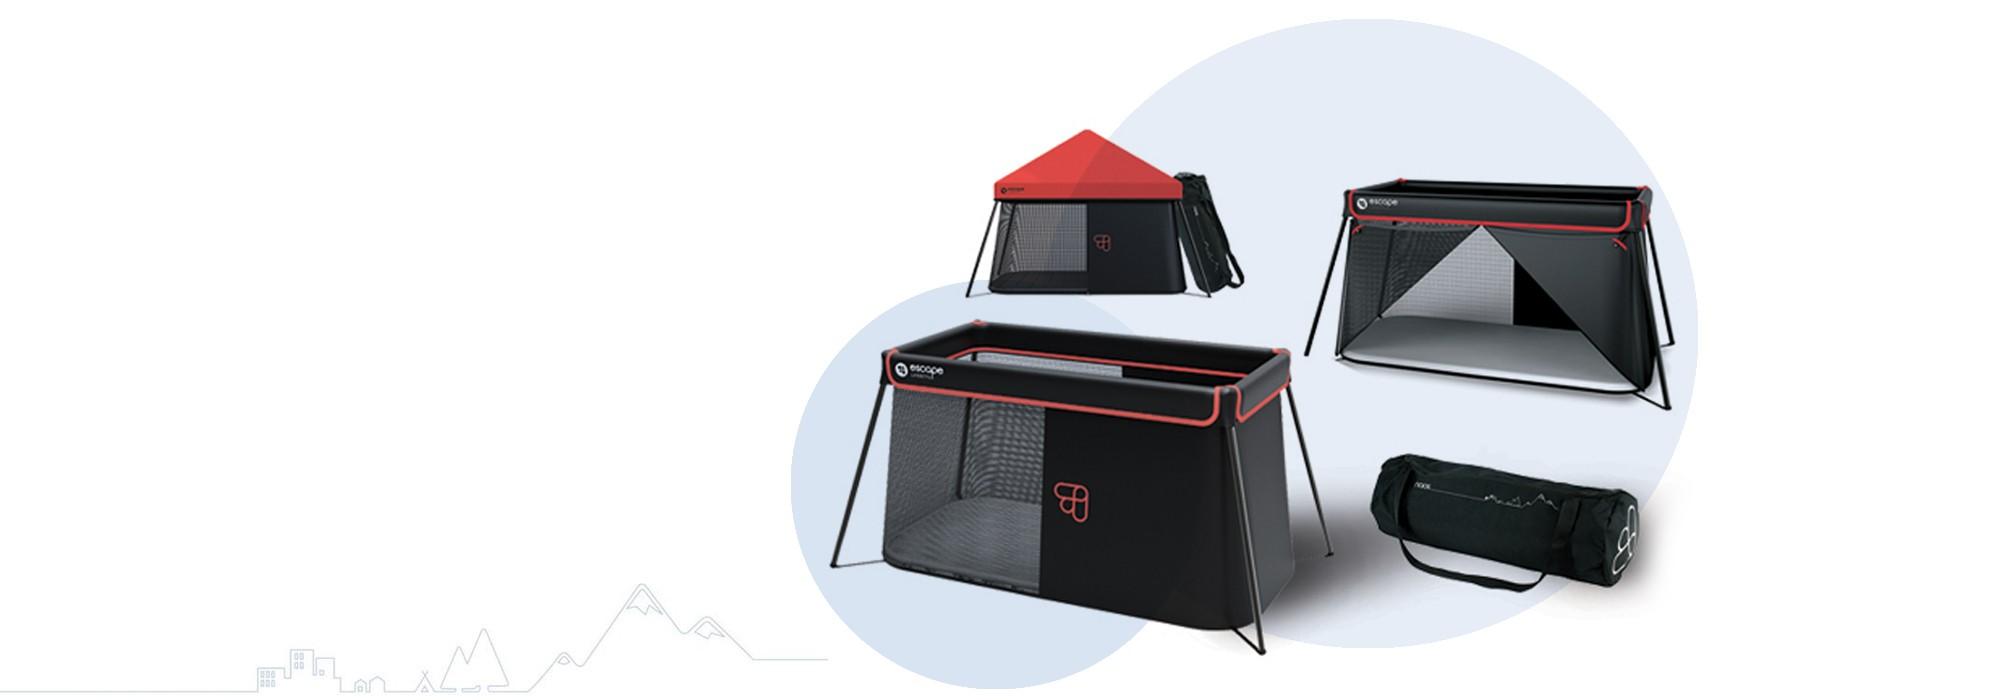 Umbrella bed for babies